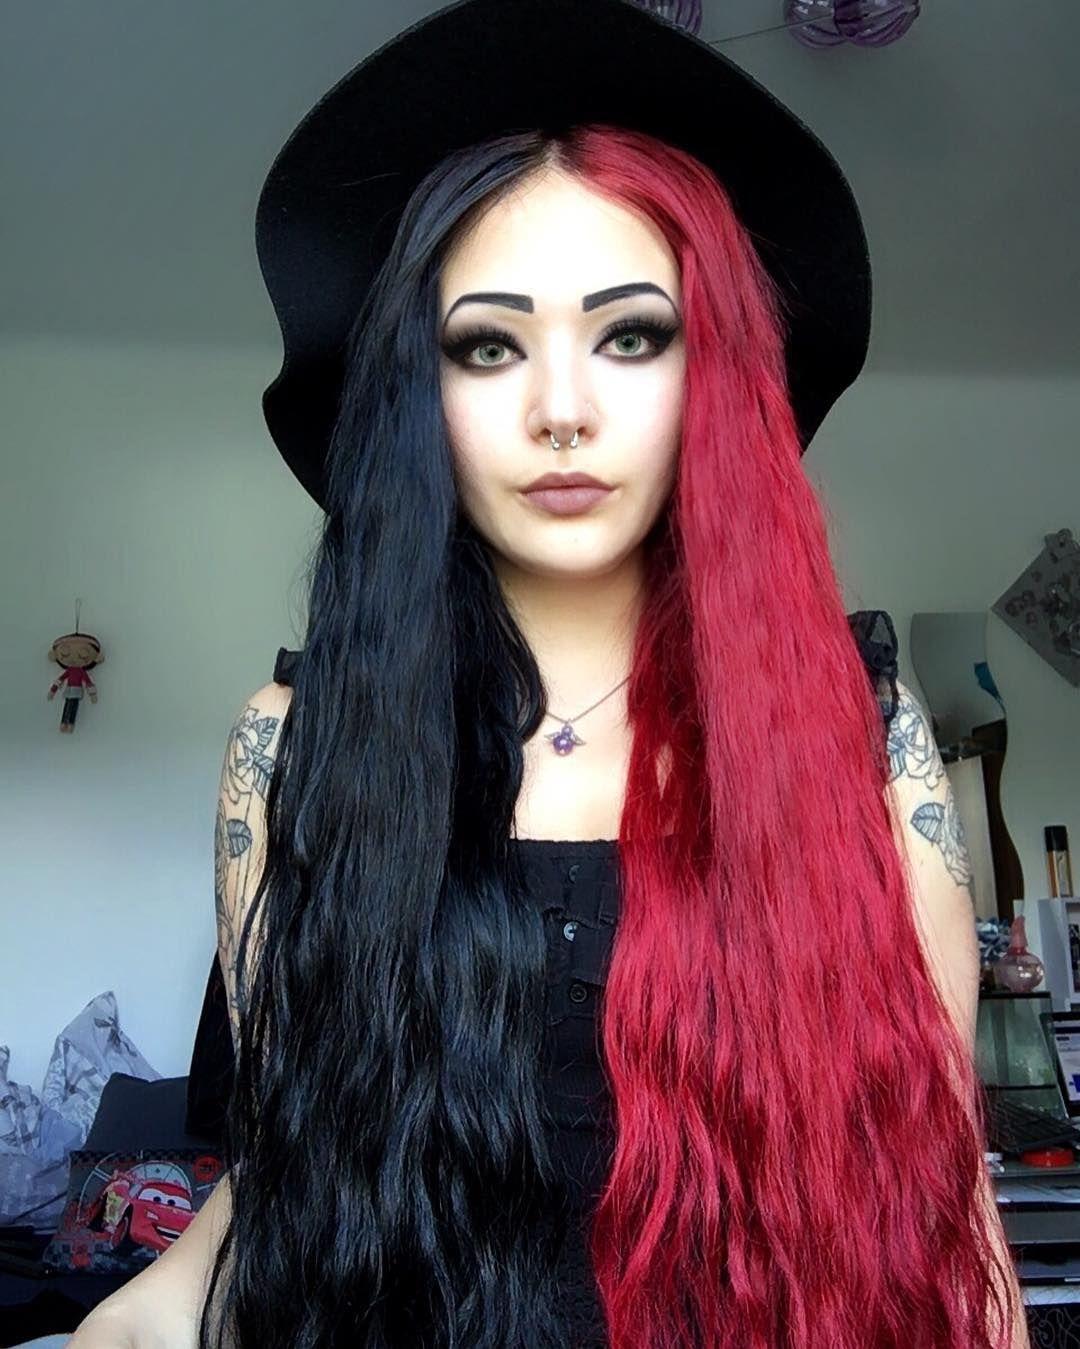 All Of Us Are Sick Gothgirl Halfheadarmy Halfhair Halfhead Alternativegirl Scenegirl Tattoo Girlswithta Dyed Hair Split Dyed Hair Half Colored Hair